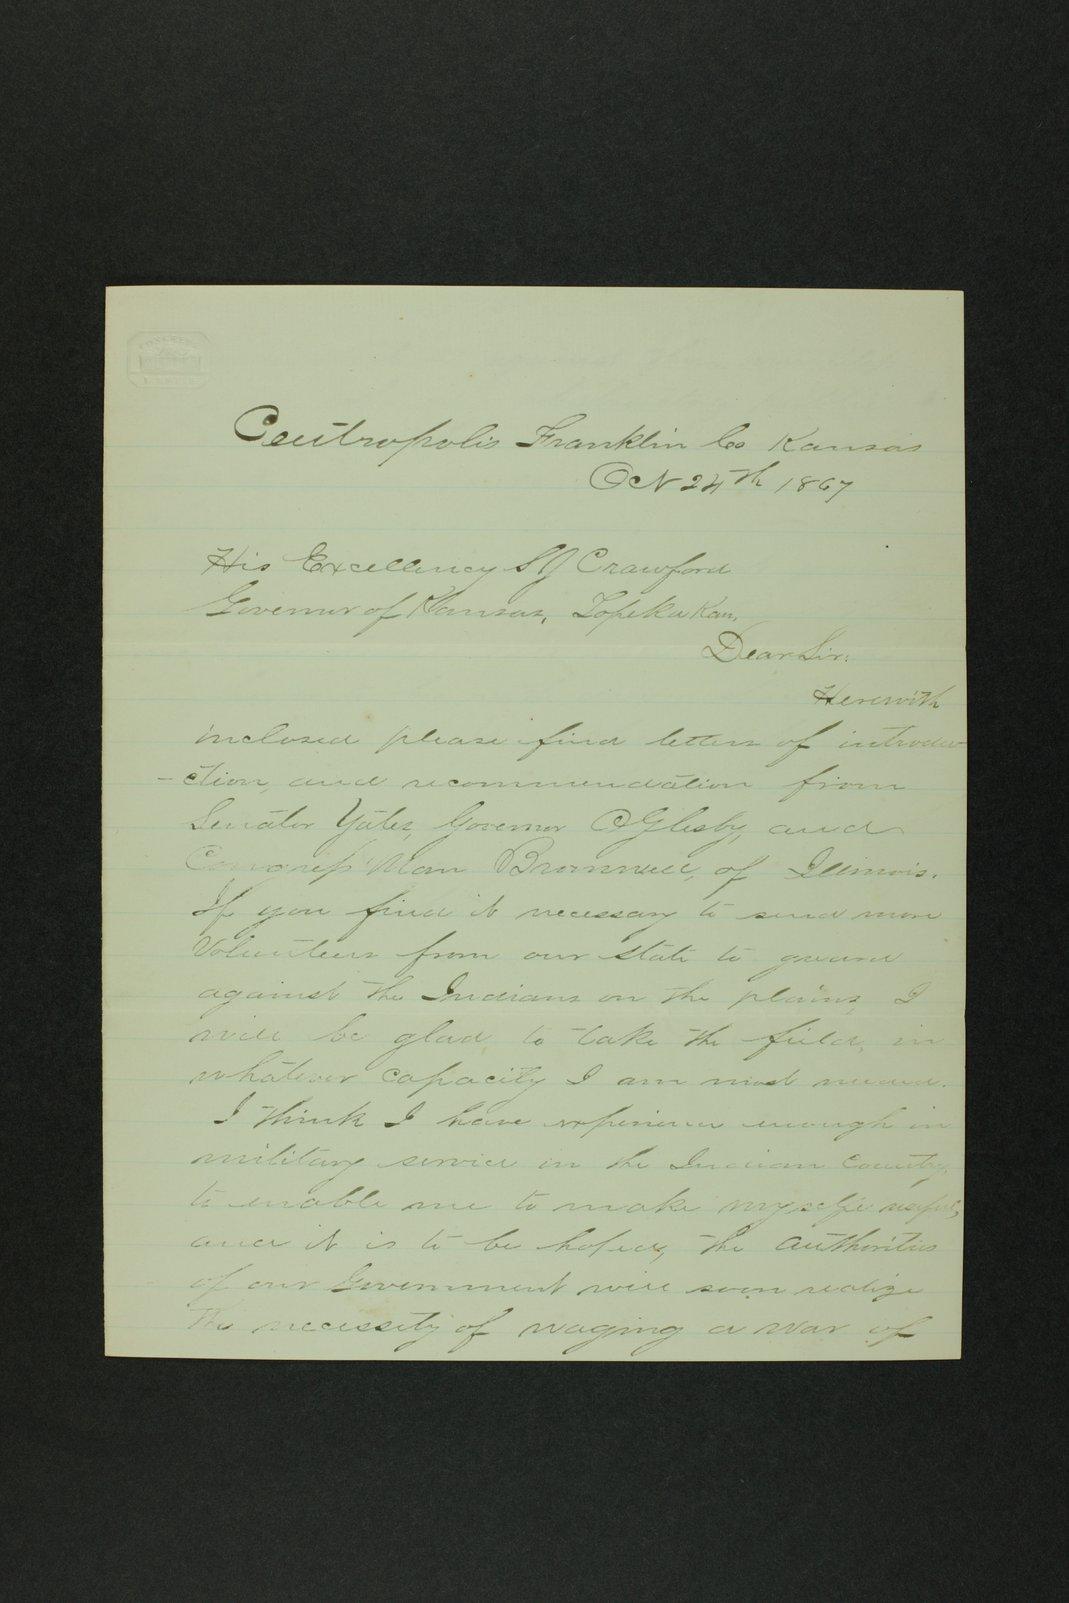 Governor Crawford Indian correspondence - 11